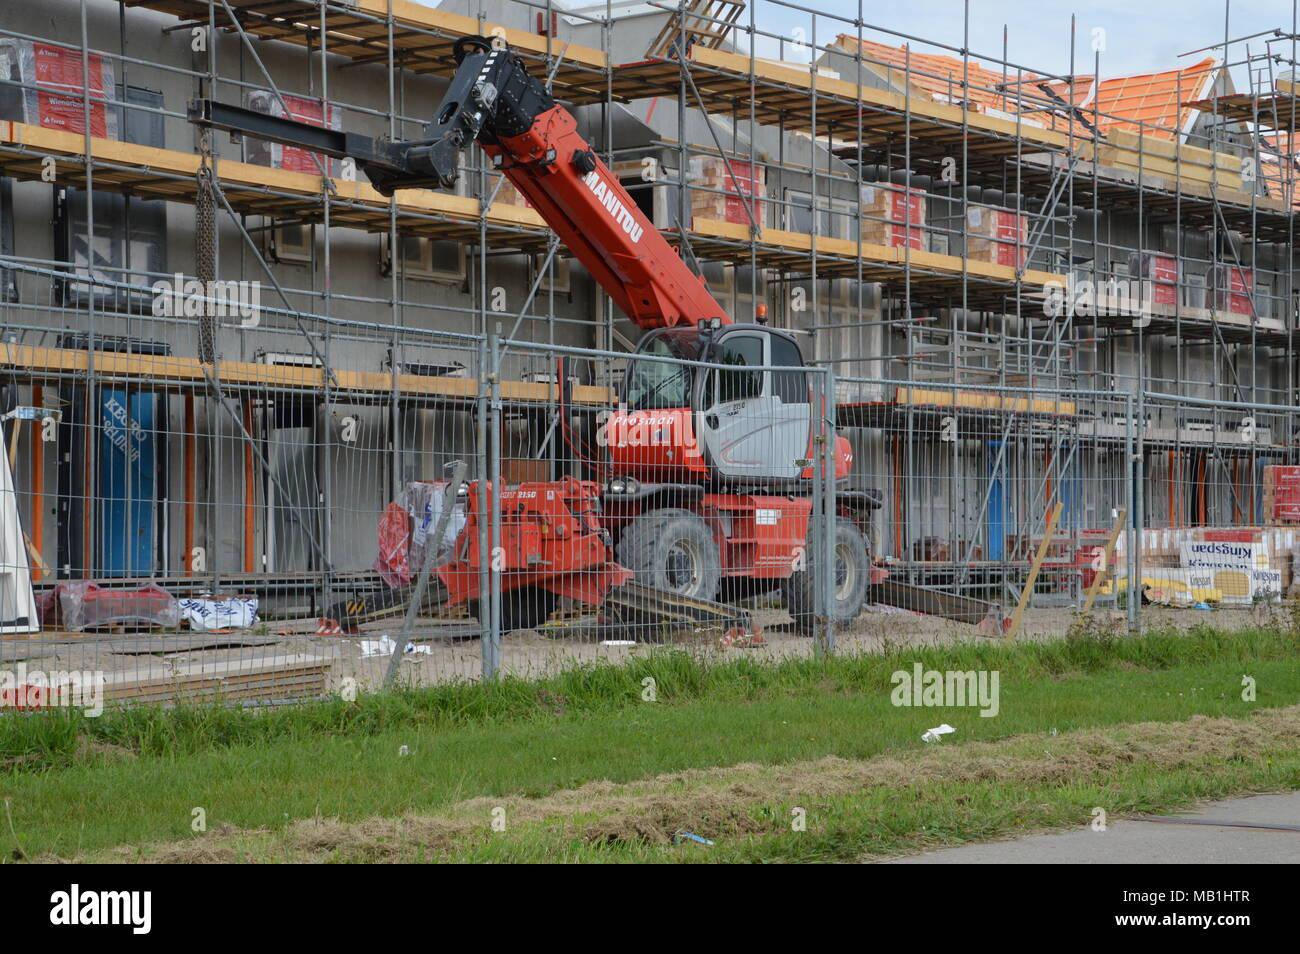 Building Houses At Diemen The Netherlands - Stock Image